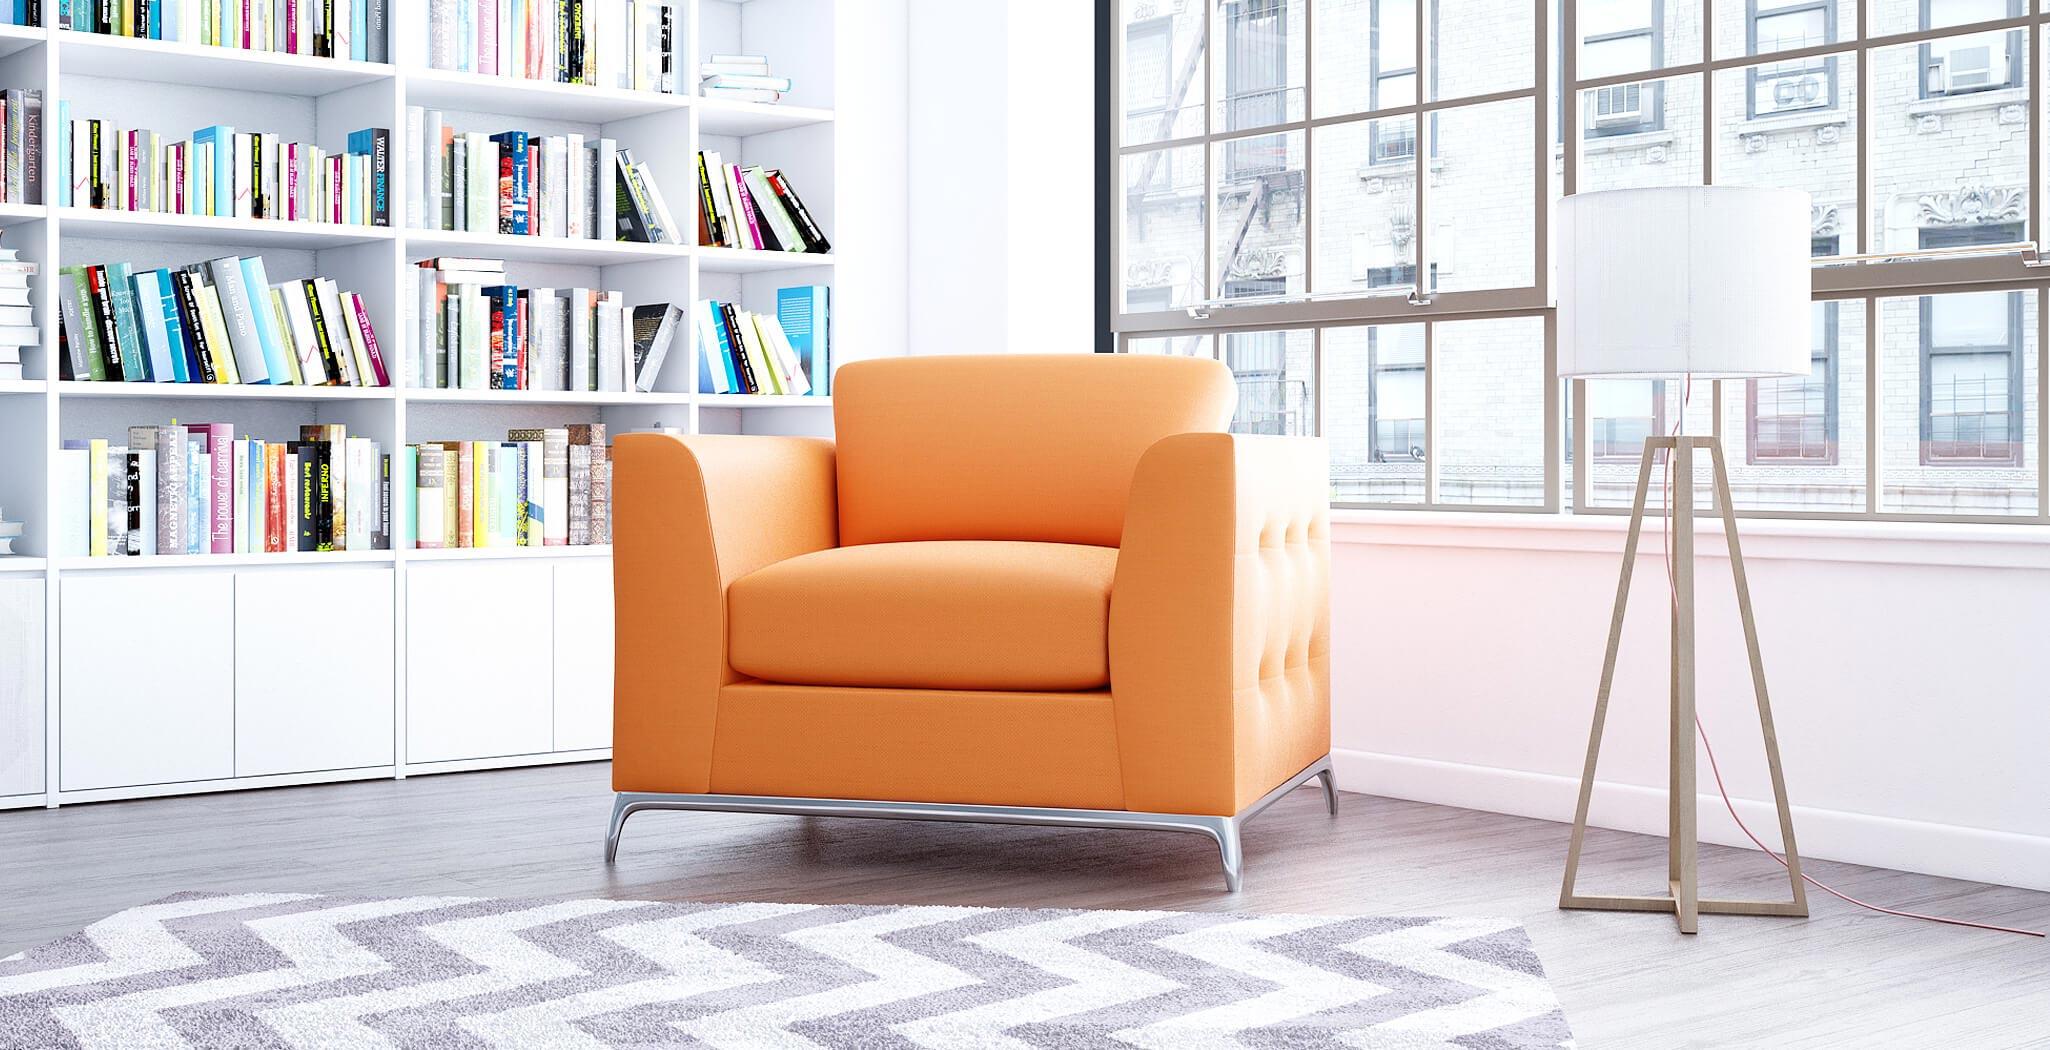 toronto chair furniture gallery 1